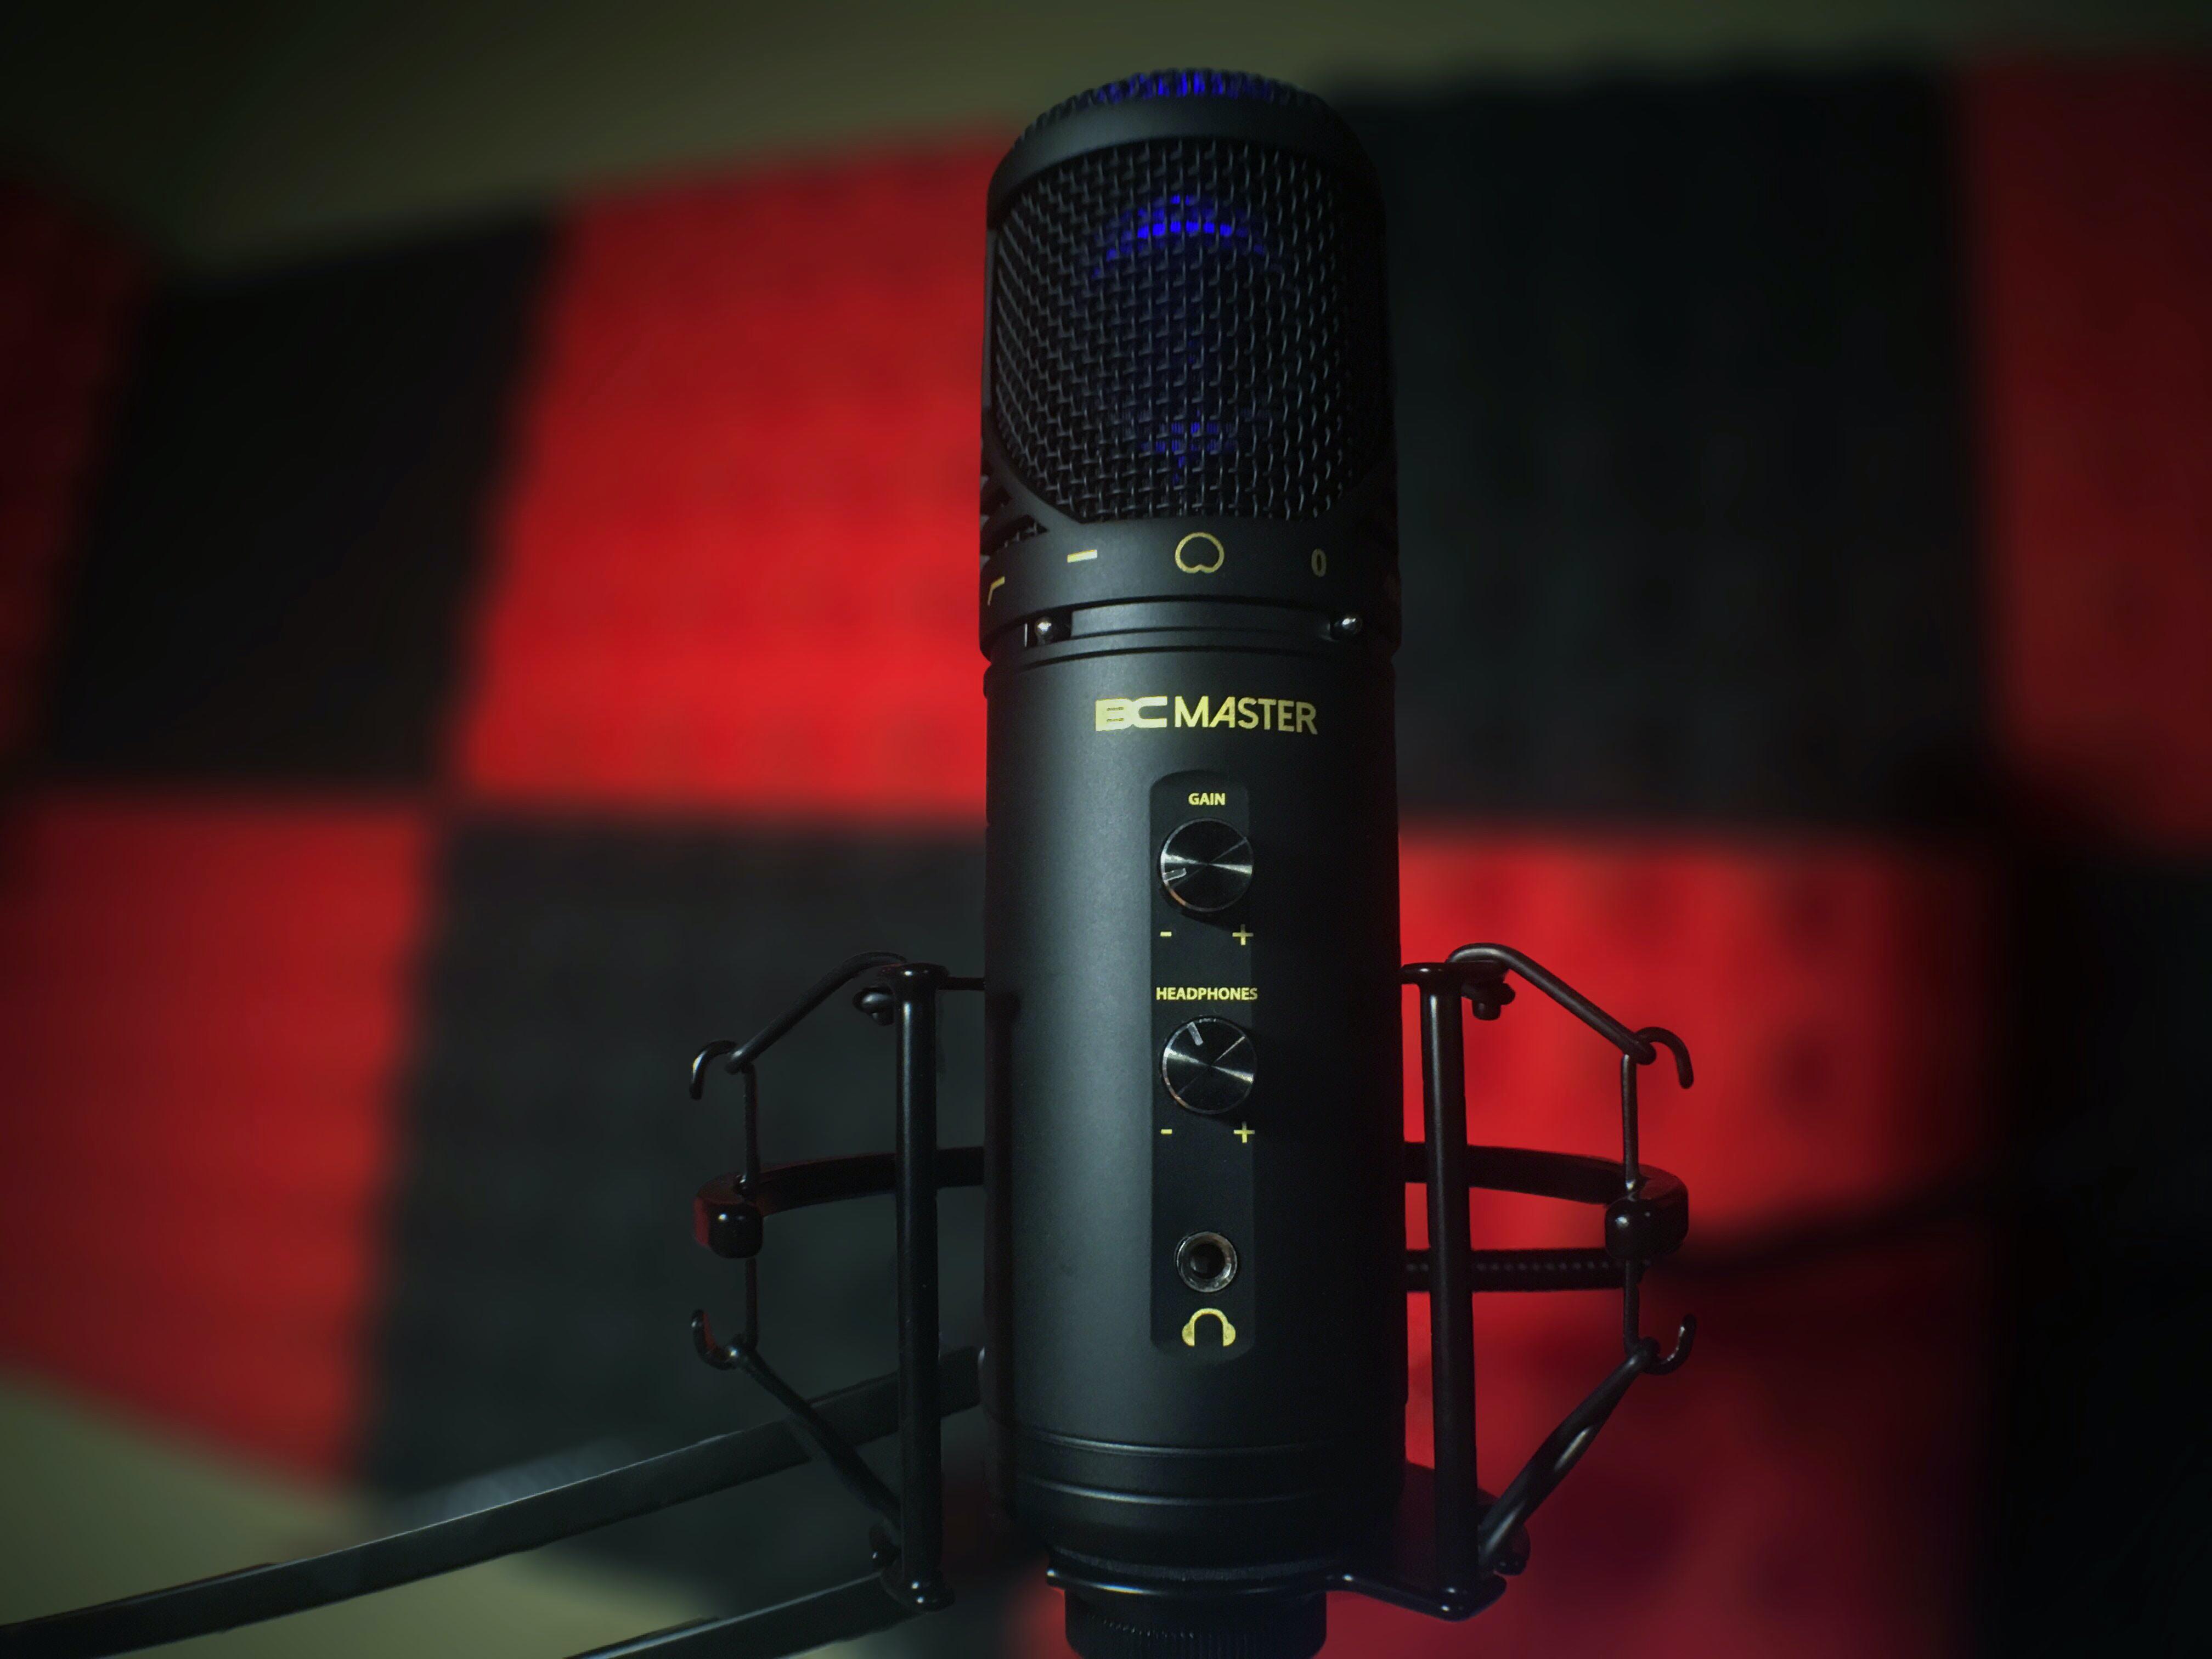 black BC Master condenser microphone selective focal photo